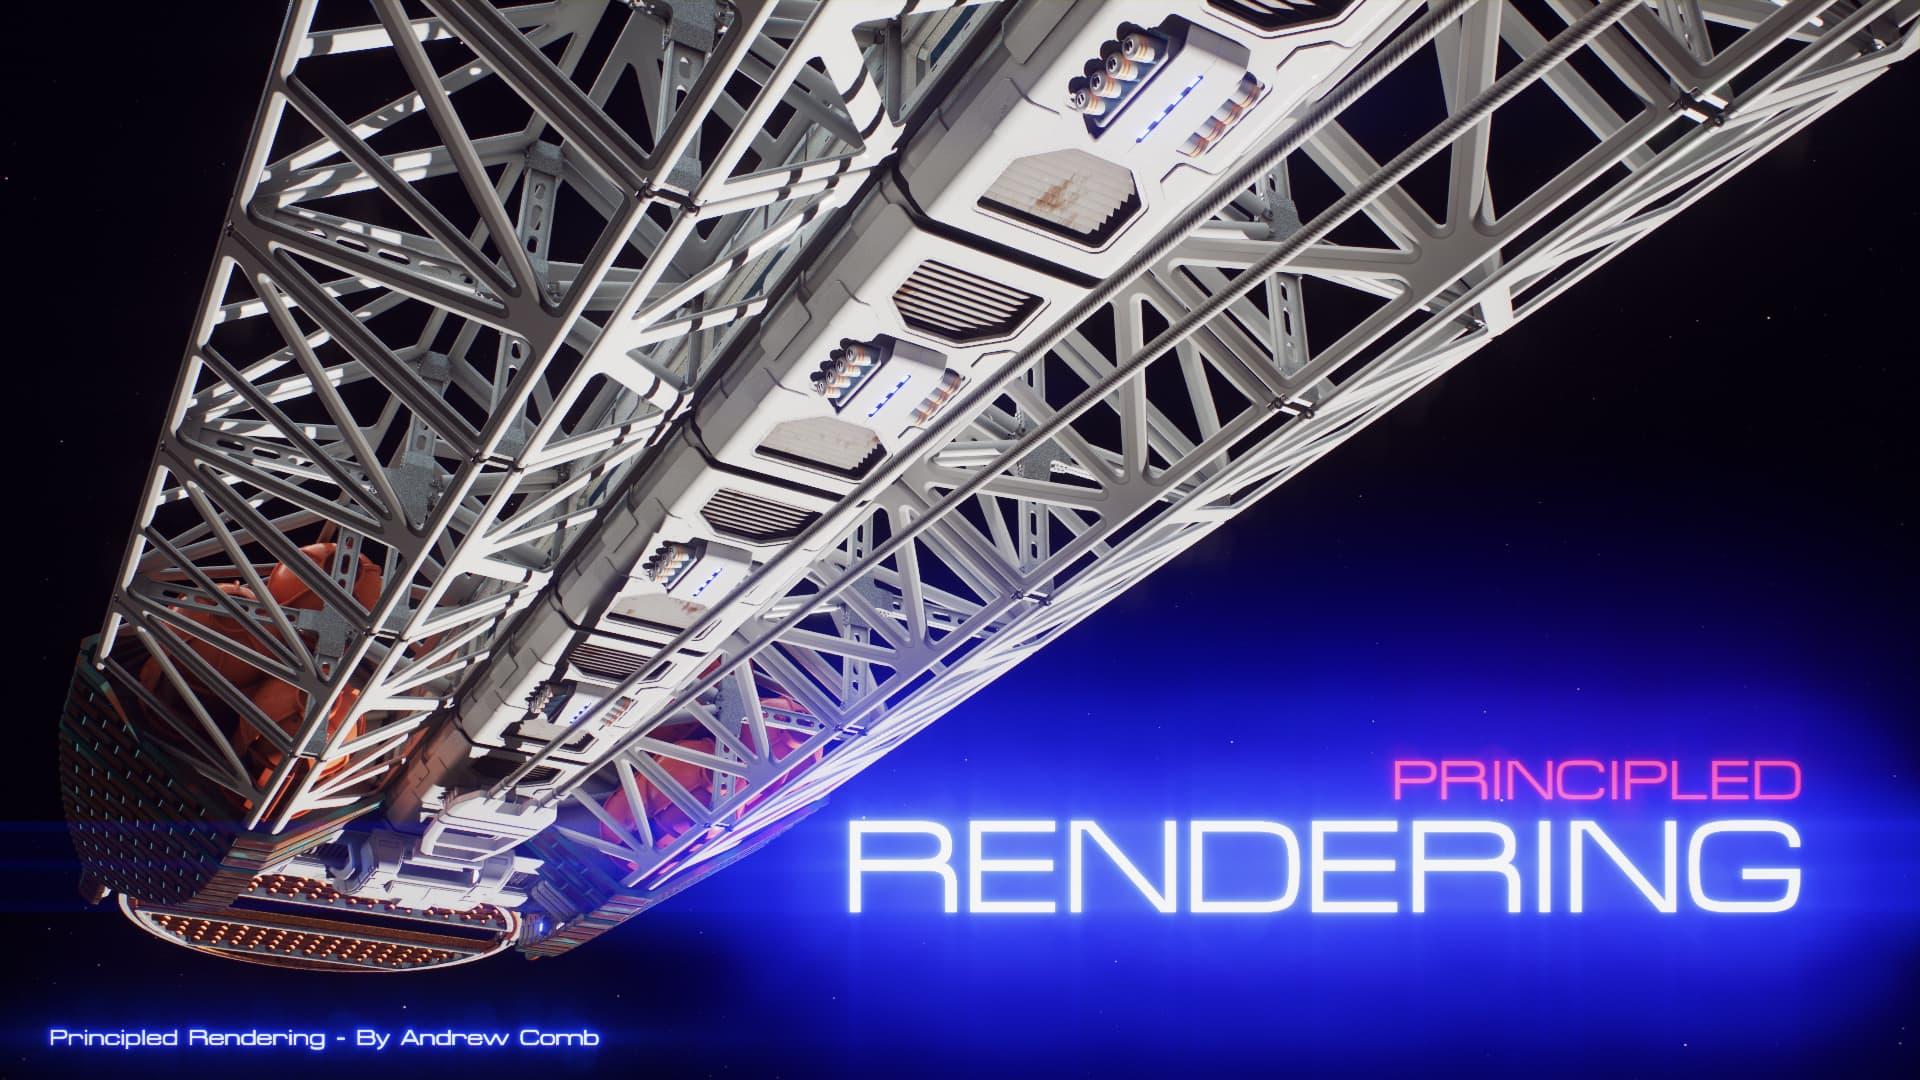 Principled Rendering